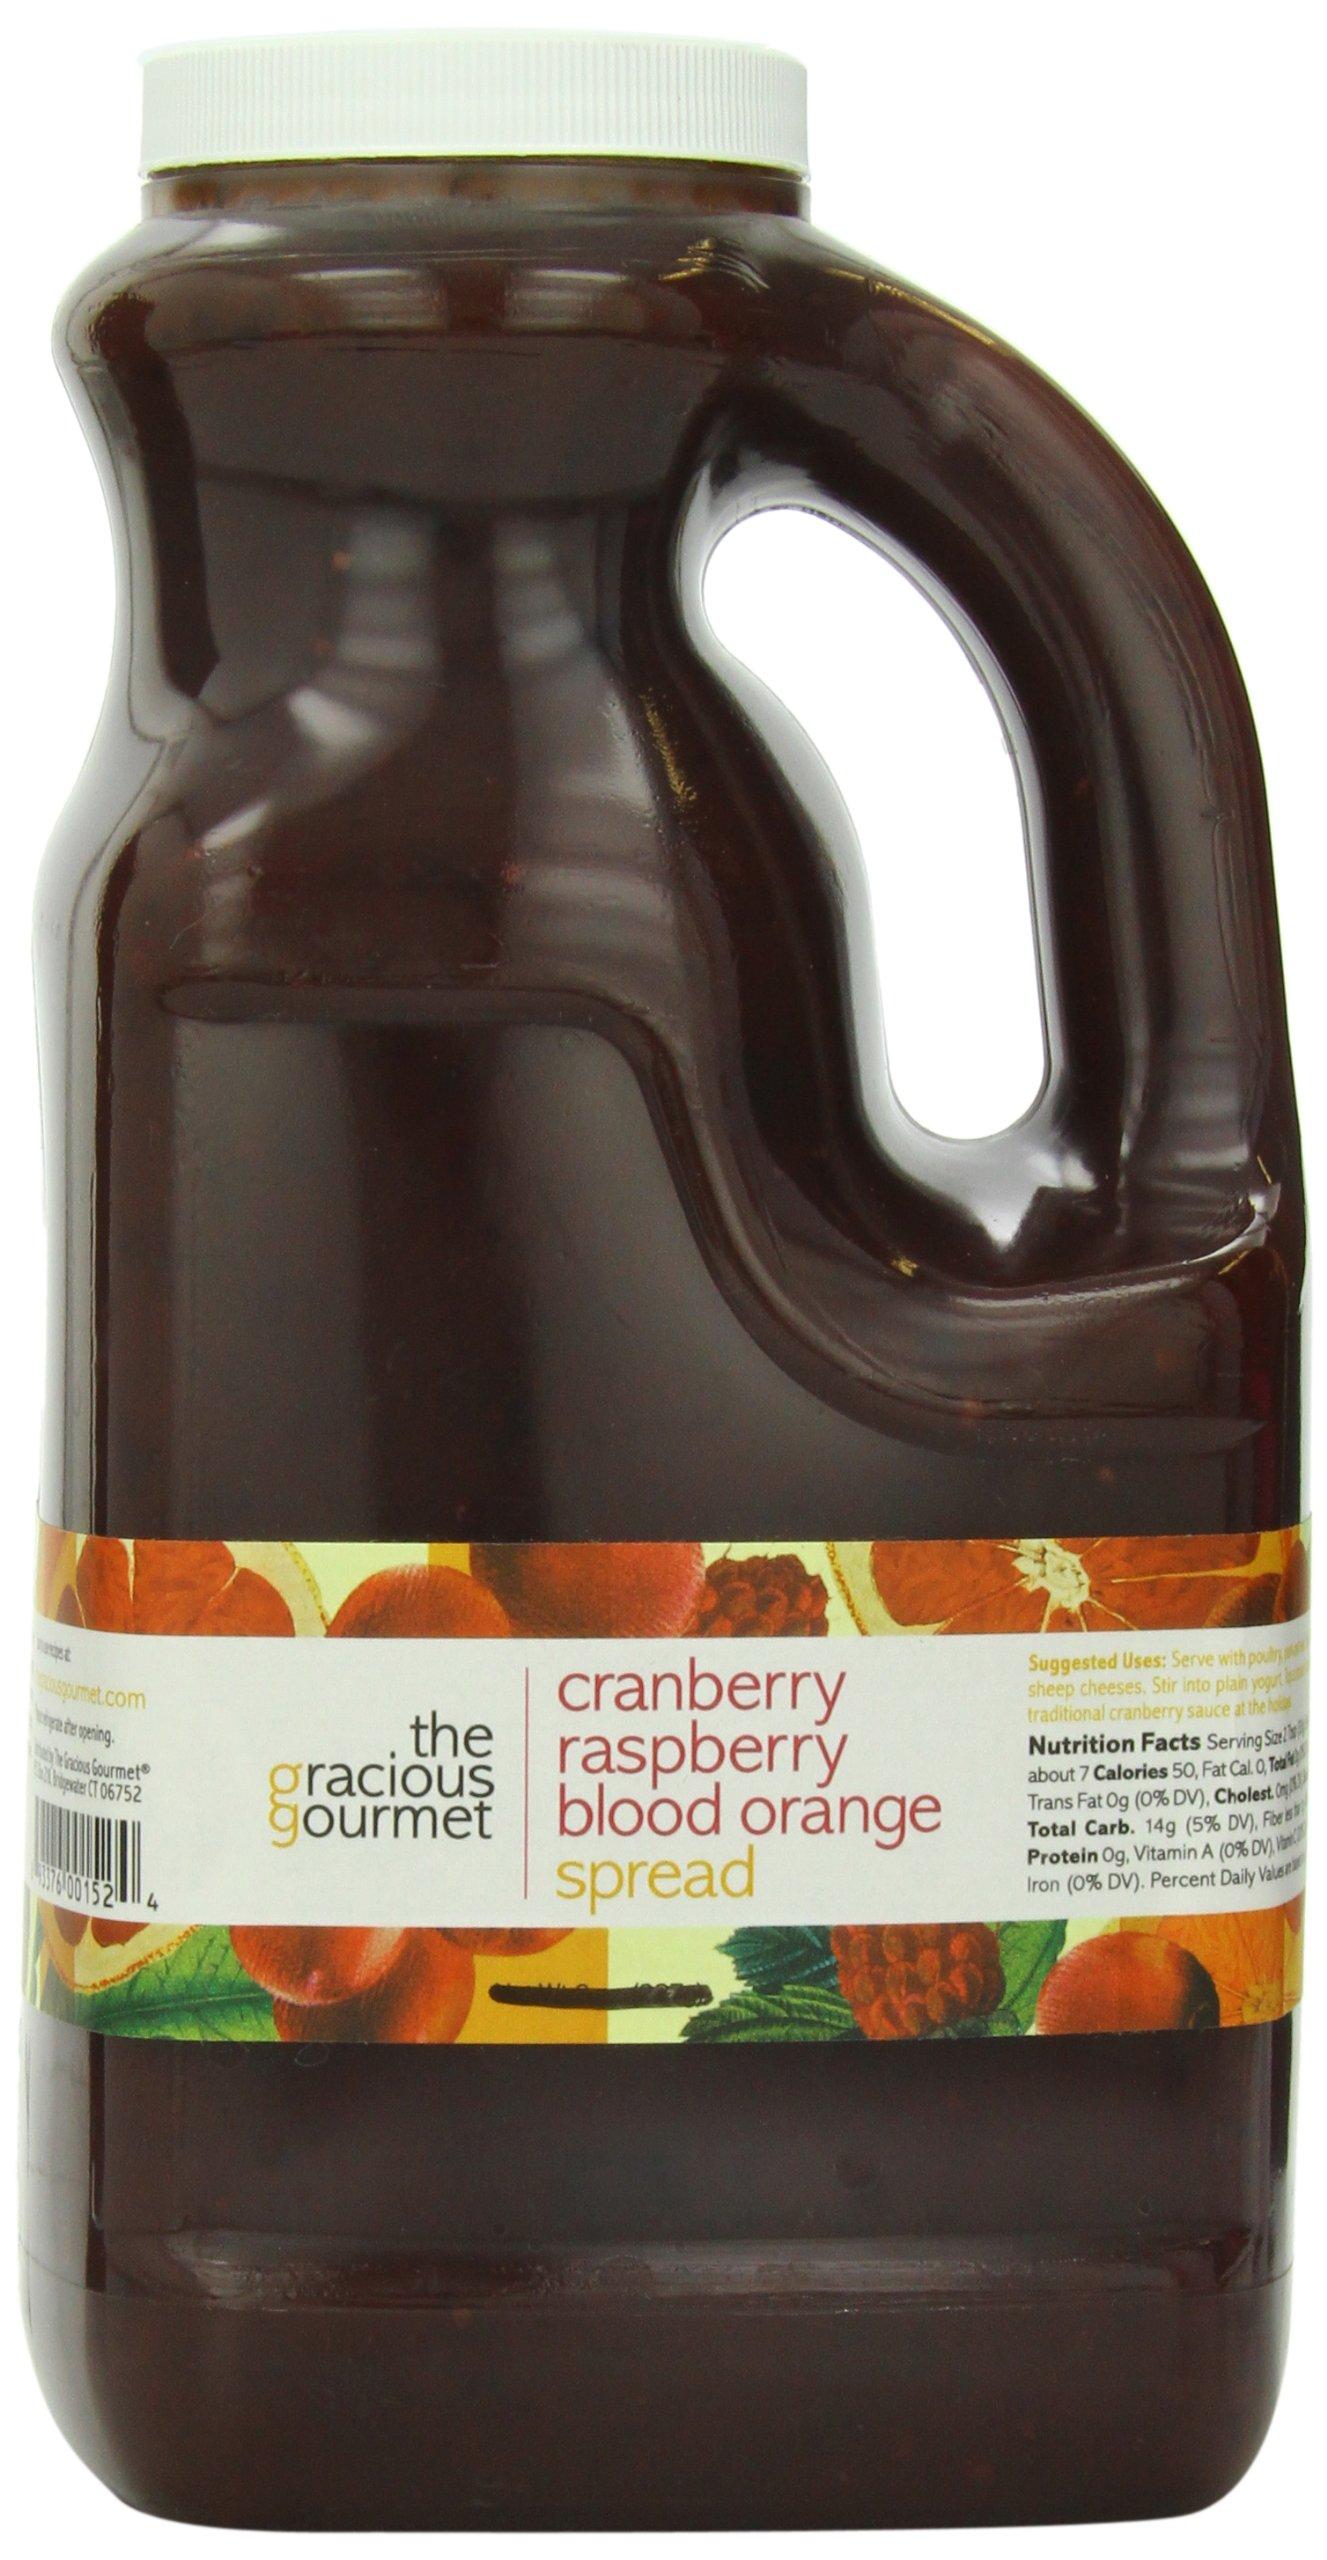 The Gracious Gourmet Cranberry Raspberry Blood Orange Spread, 76-Ounce